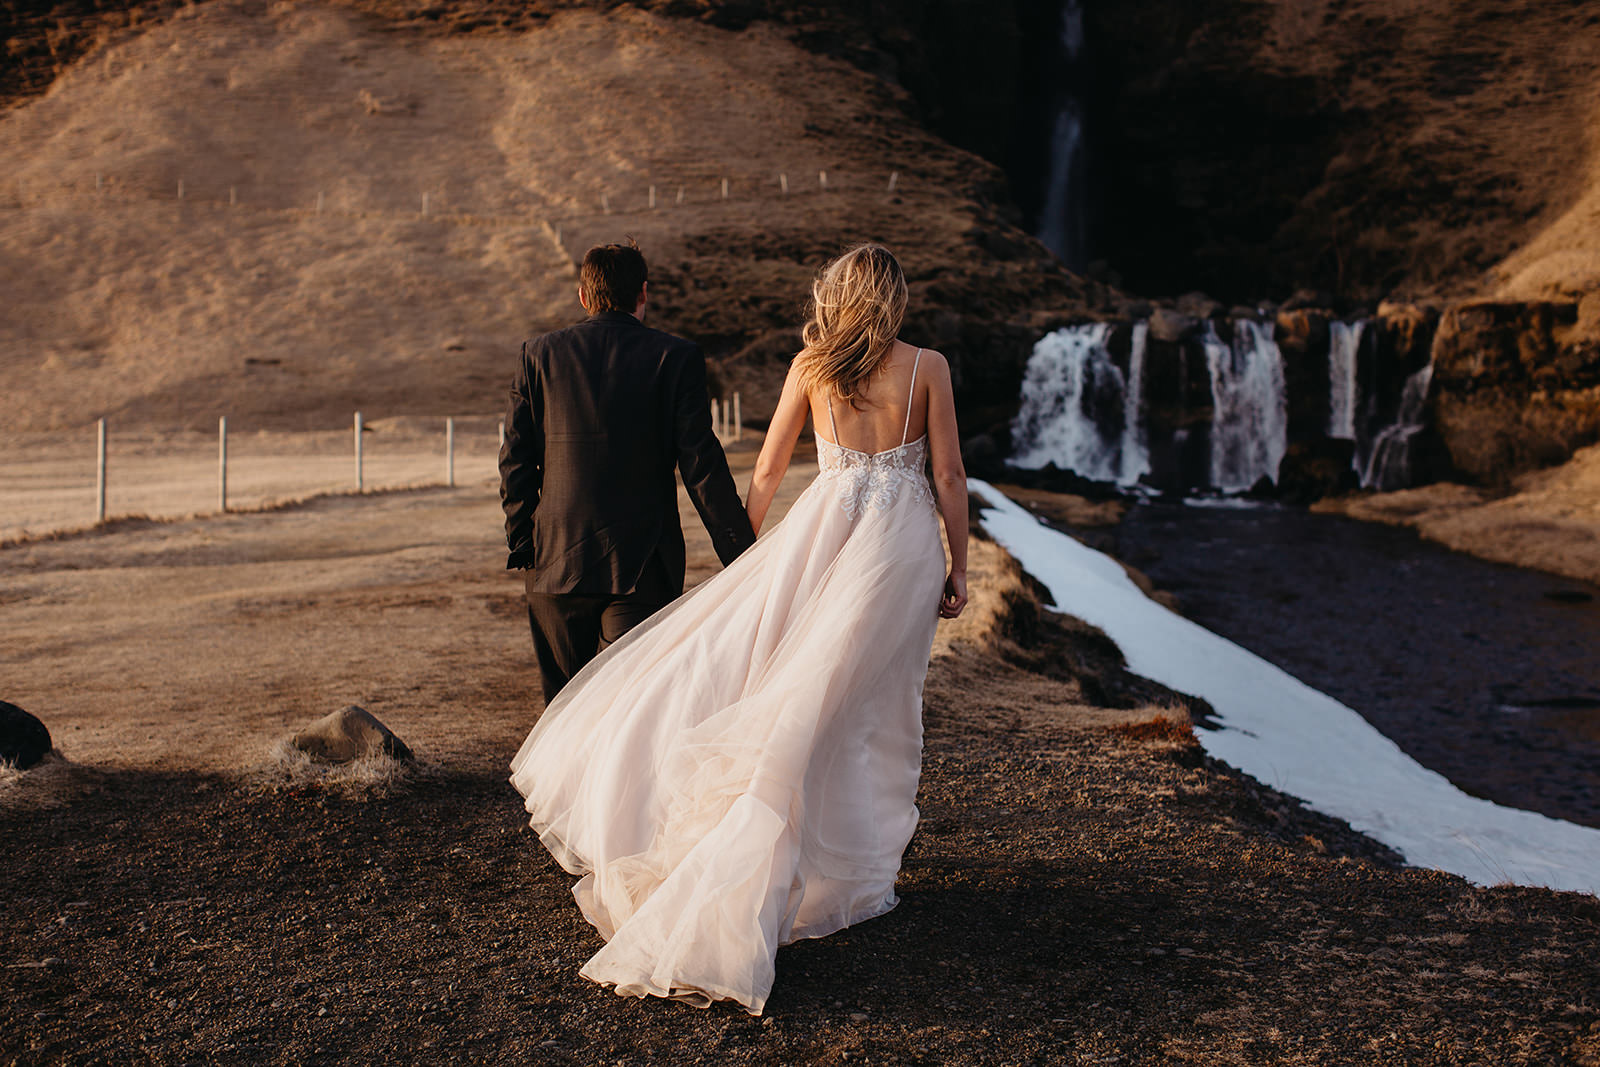 Icelandic Iceland Elopement Wedding Elope Photographer Eloping Reykjavík Vik Black Sand Beach Jökulsárlón Skogafoss Waterfall Vestrahorn Mountain Liz Osban Photography Destination 112.jpg